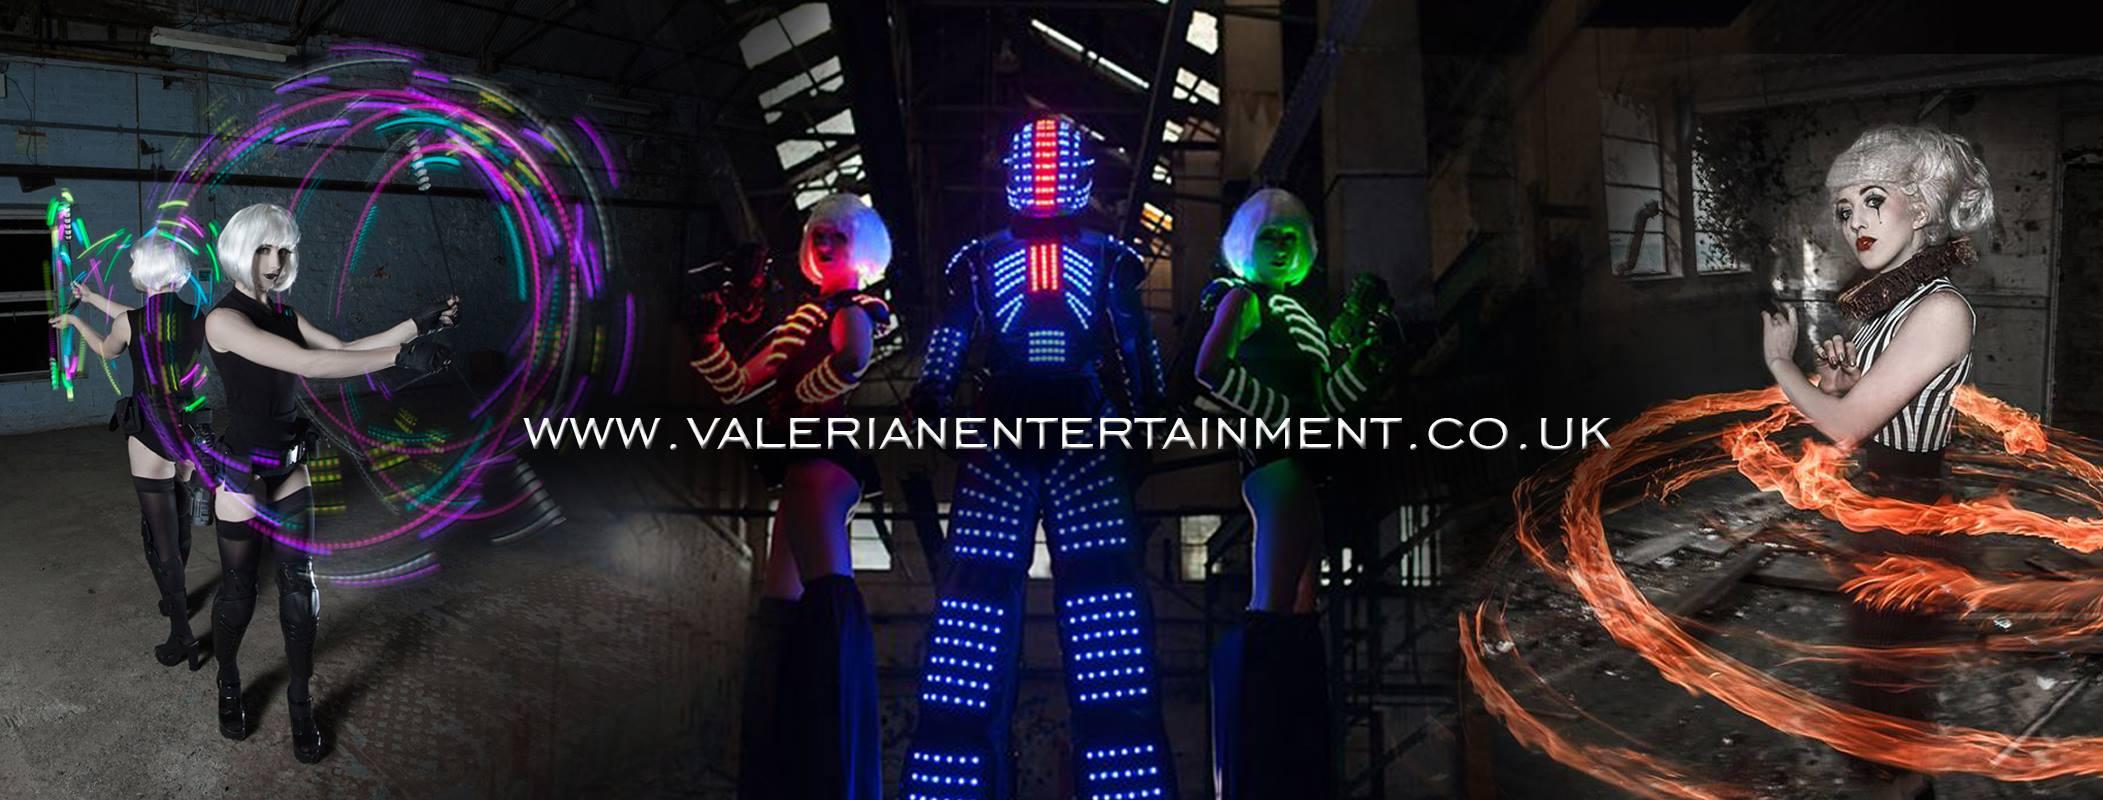 Valerian Entertainment